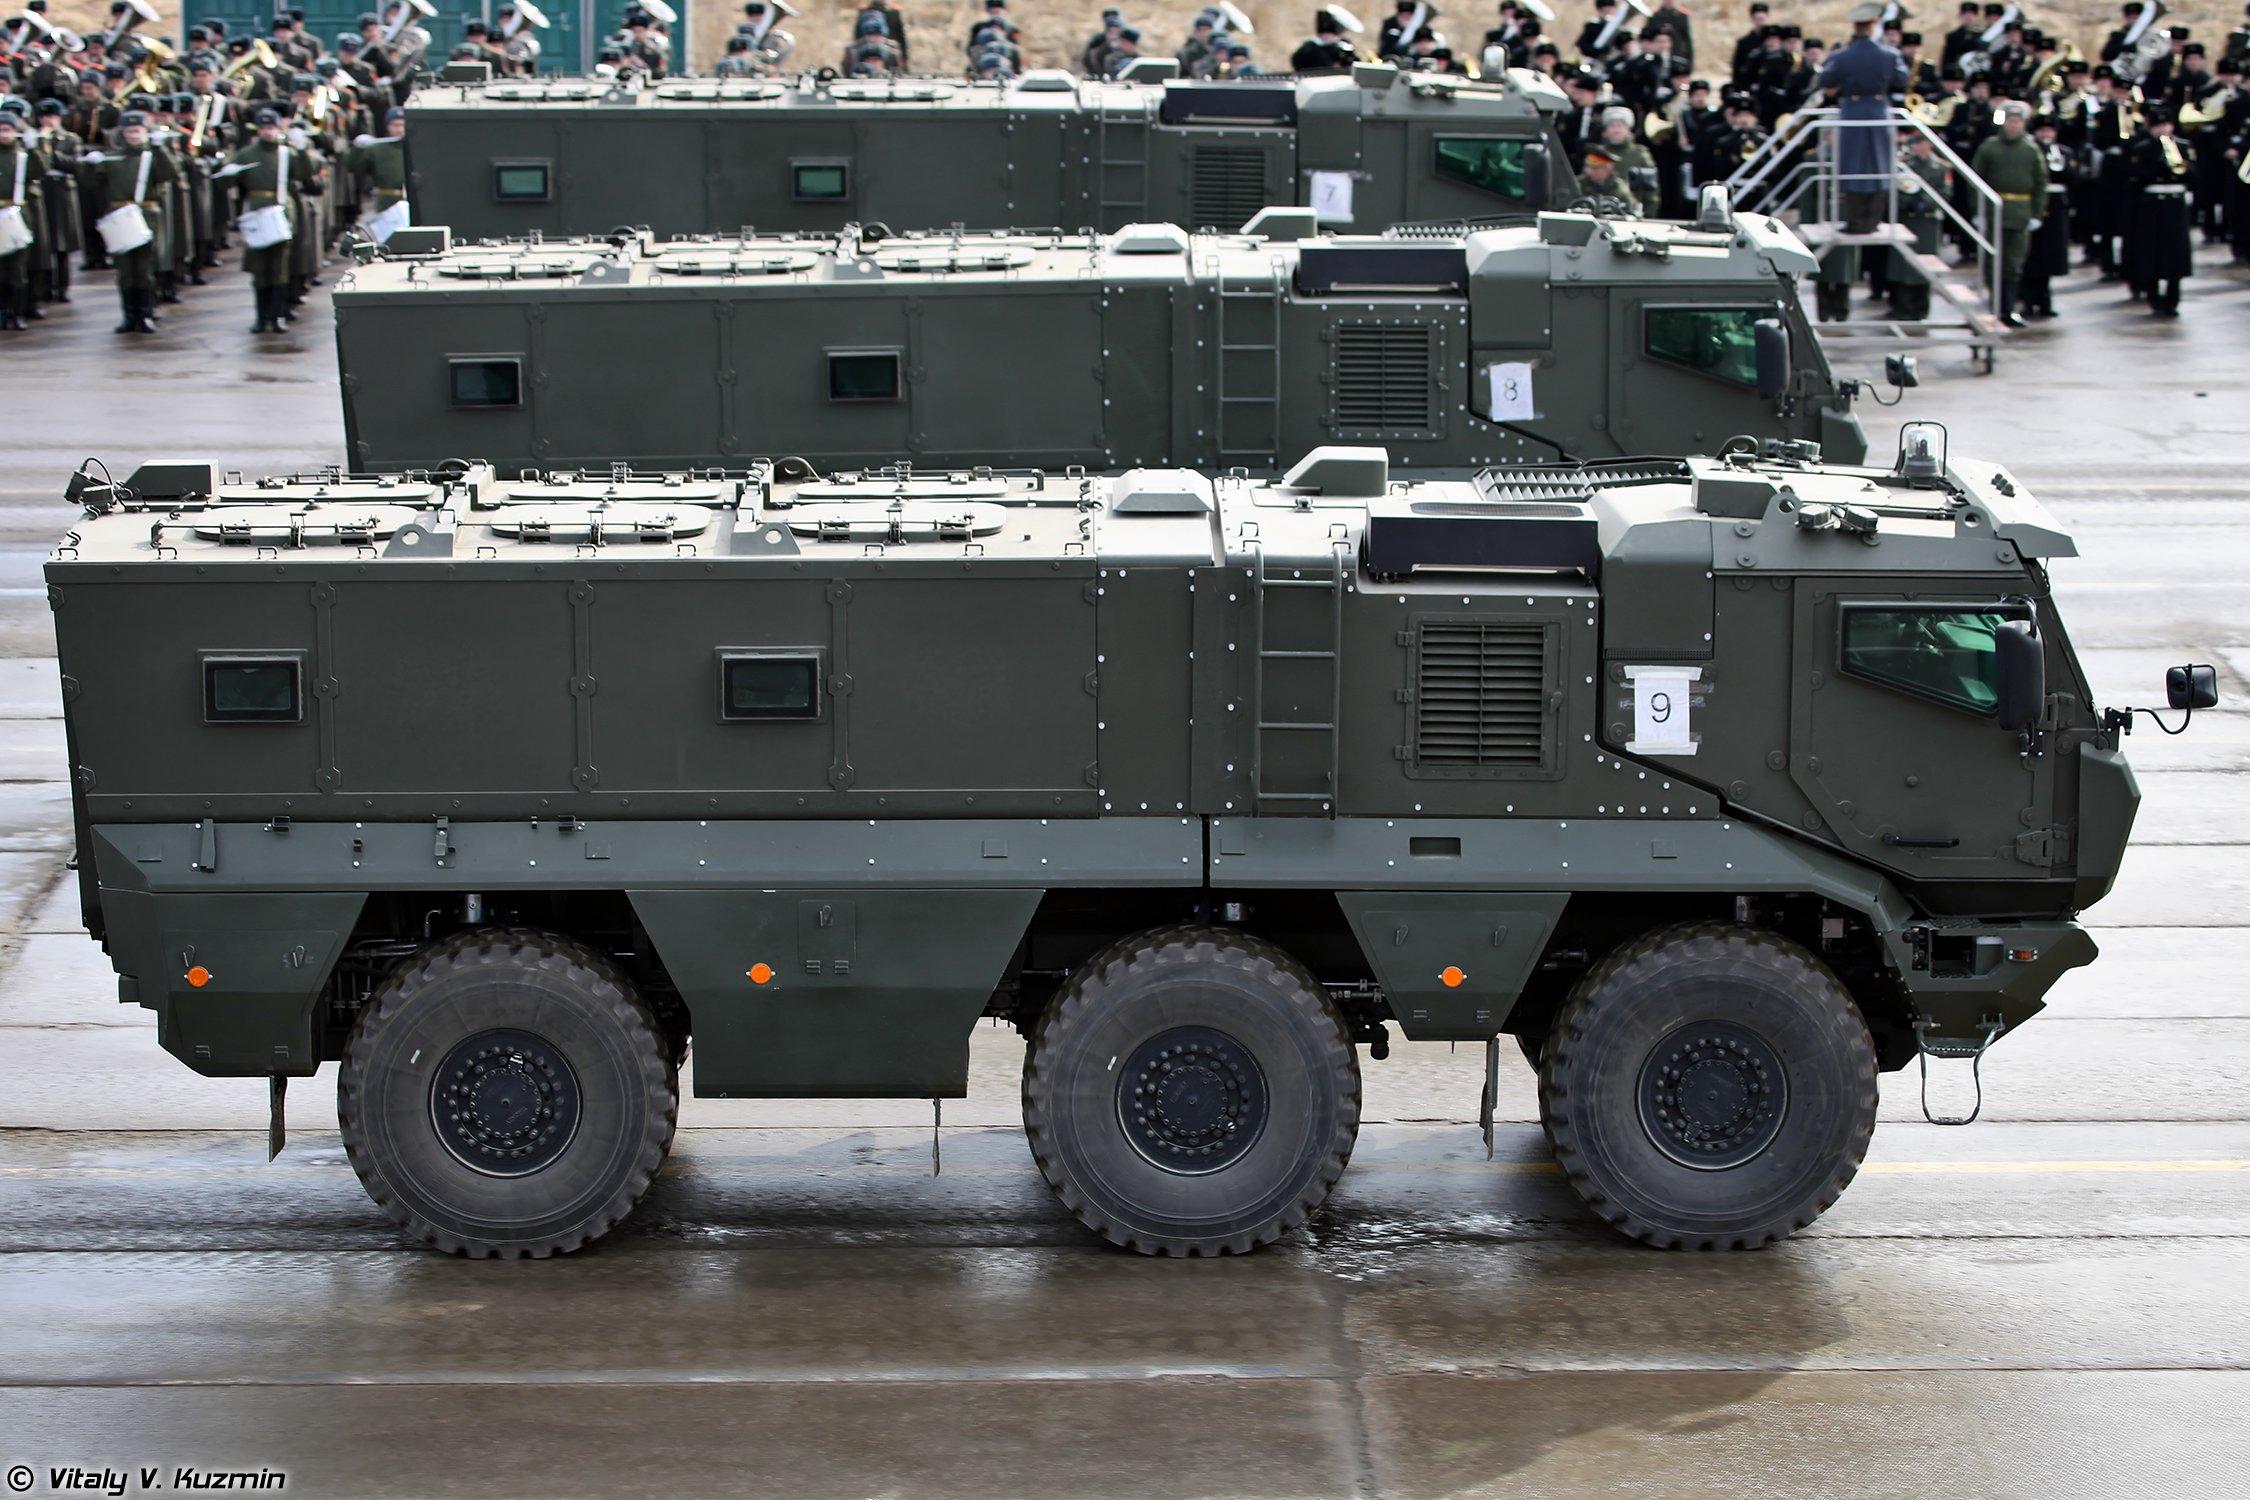 Kamaz 63968 Typhoon K Mrap Vehicle Armored Truck April 9th